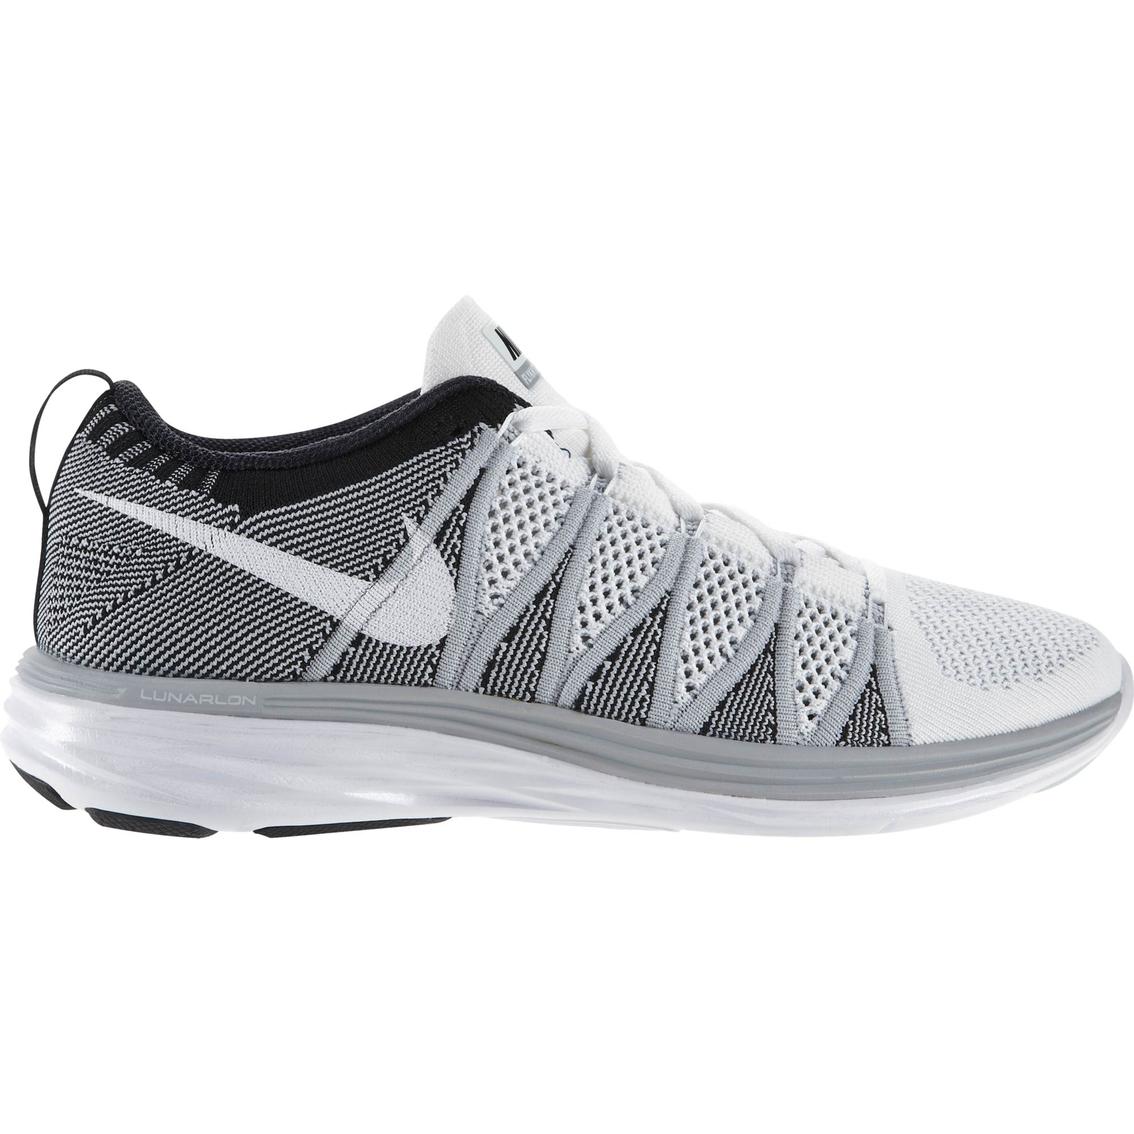 2c7cb3554572 Nike Men s Flyknit Lunar2 Running Shoes